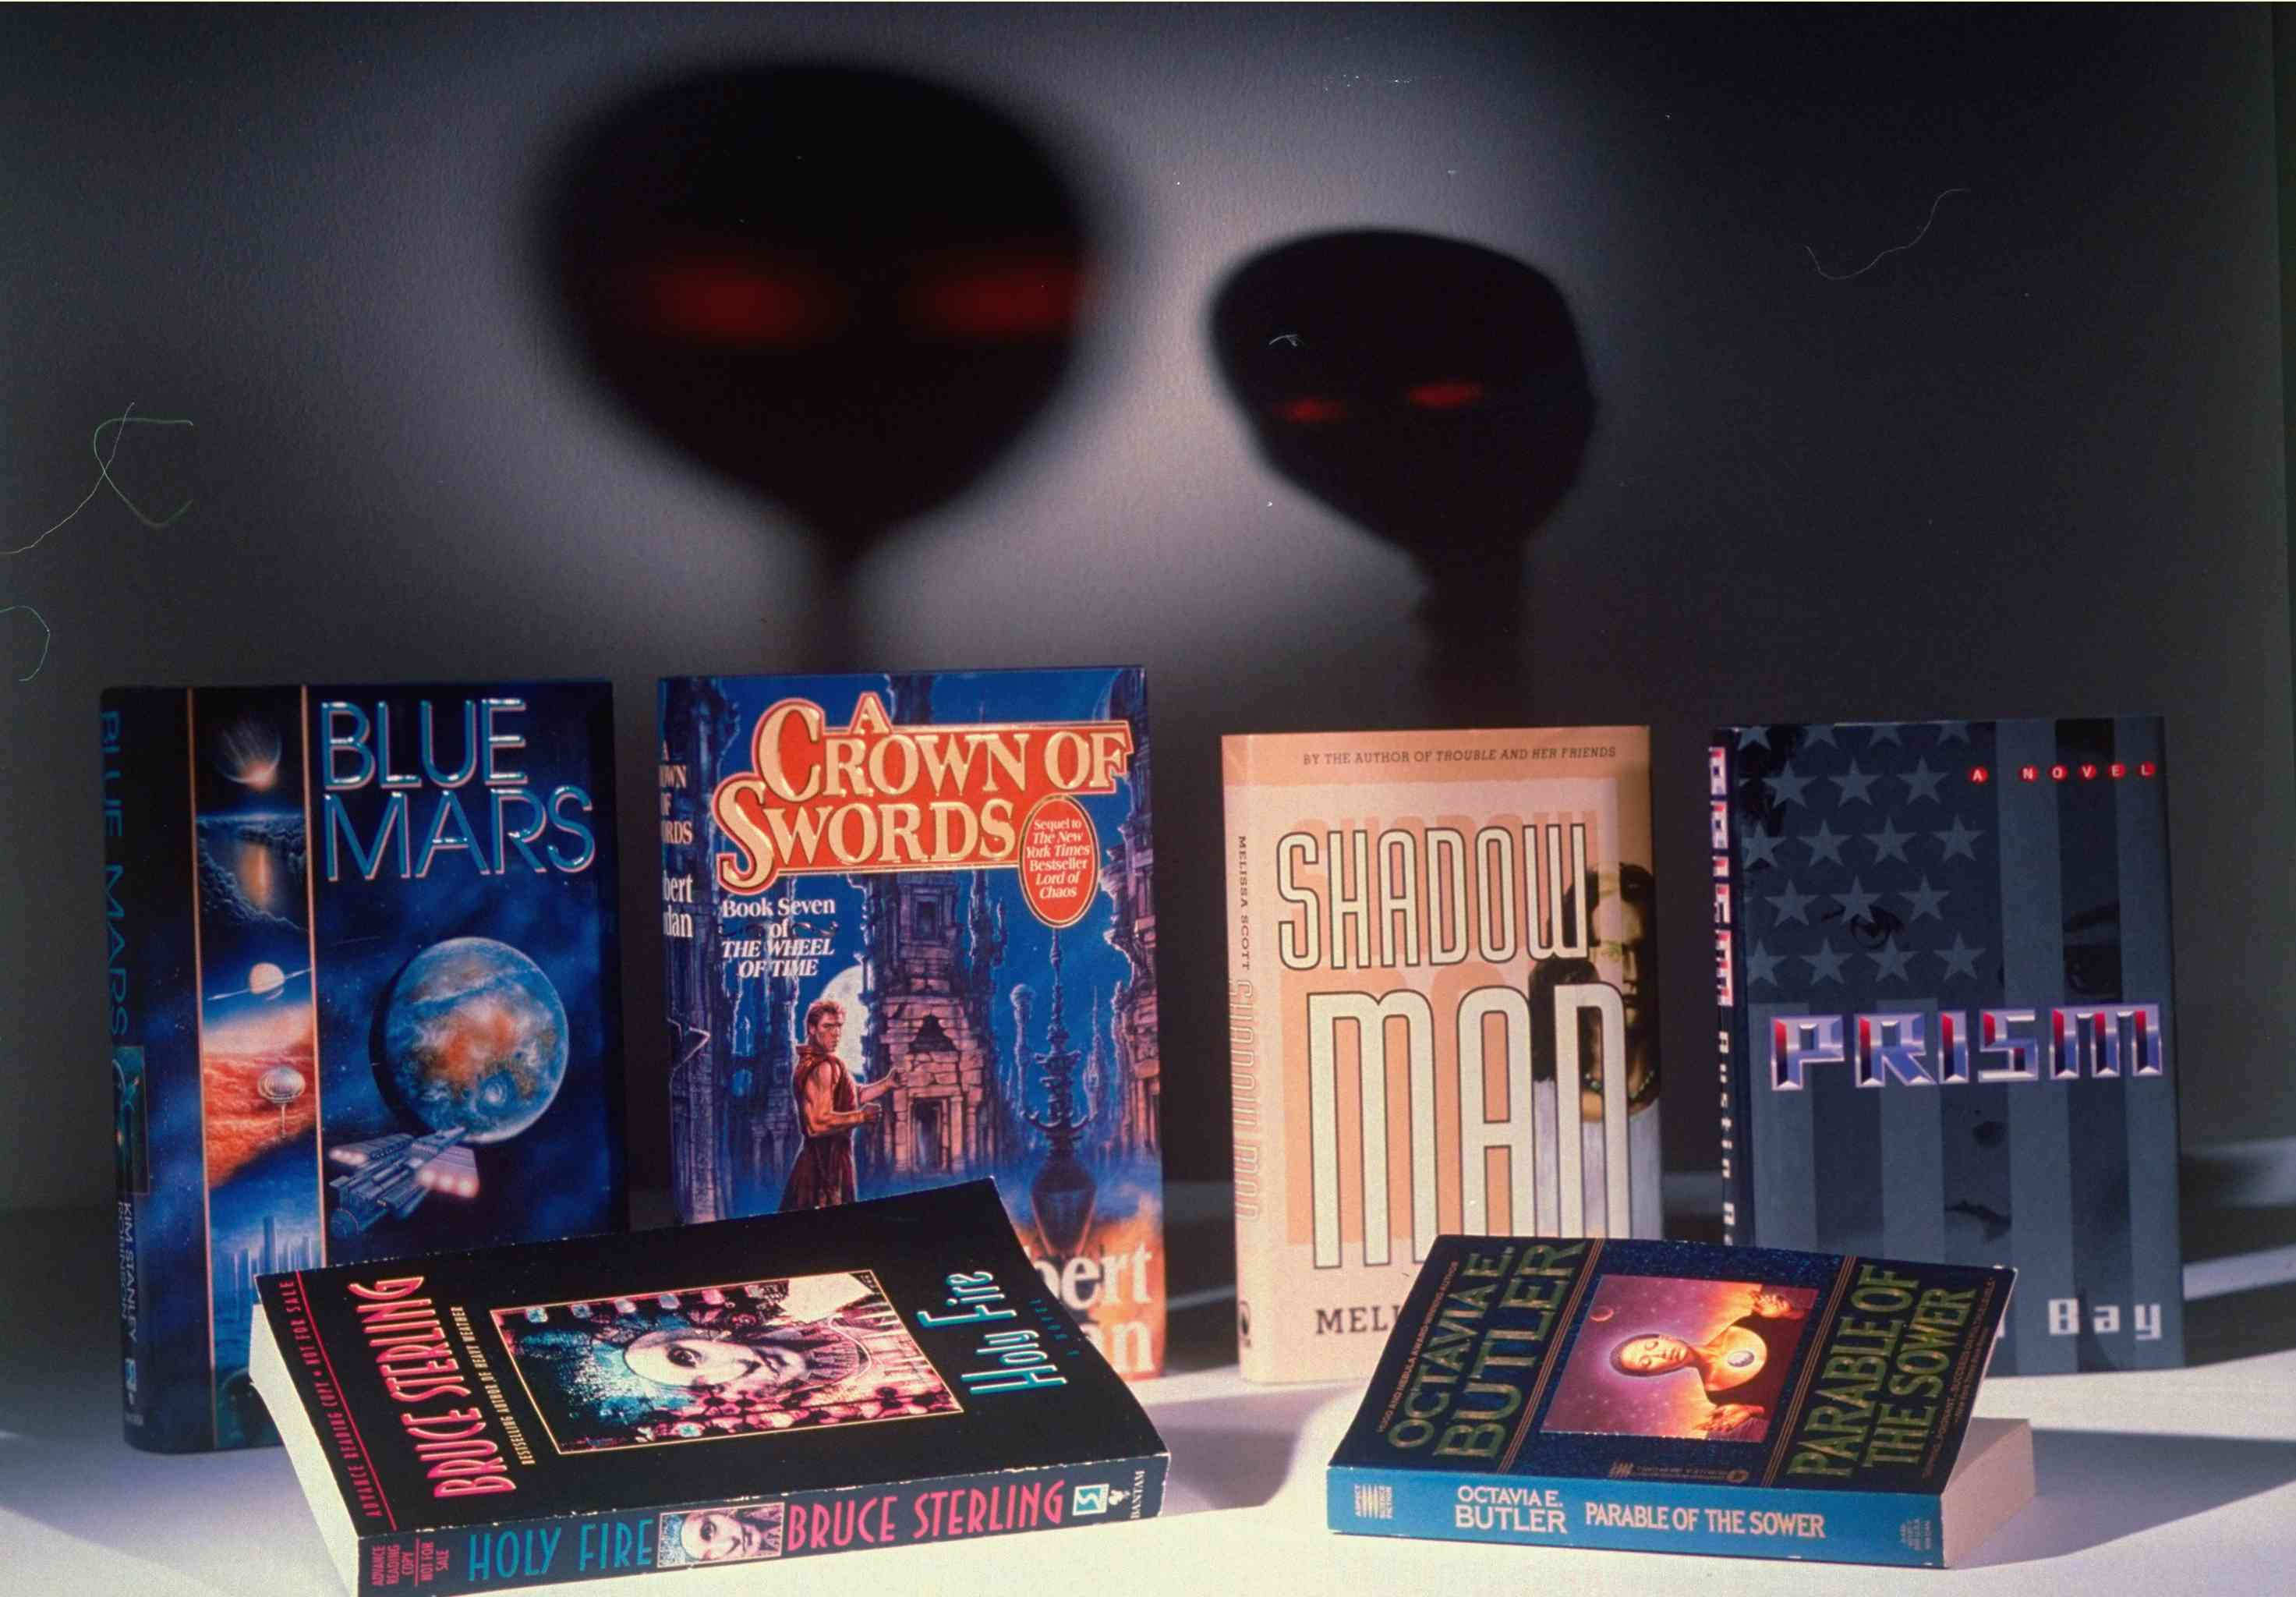 Butler's novel among other sci-fi contemporaries